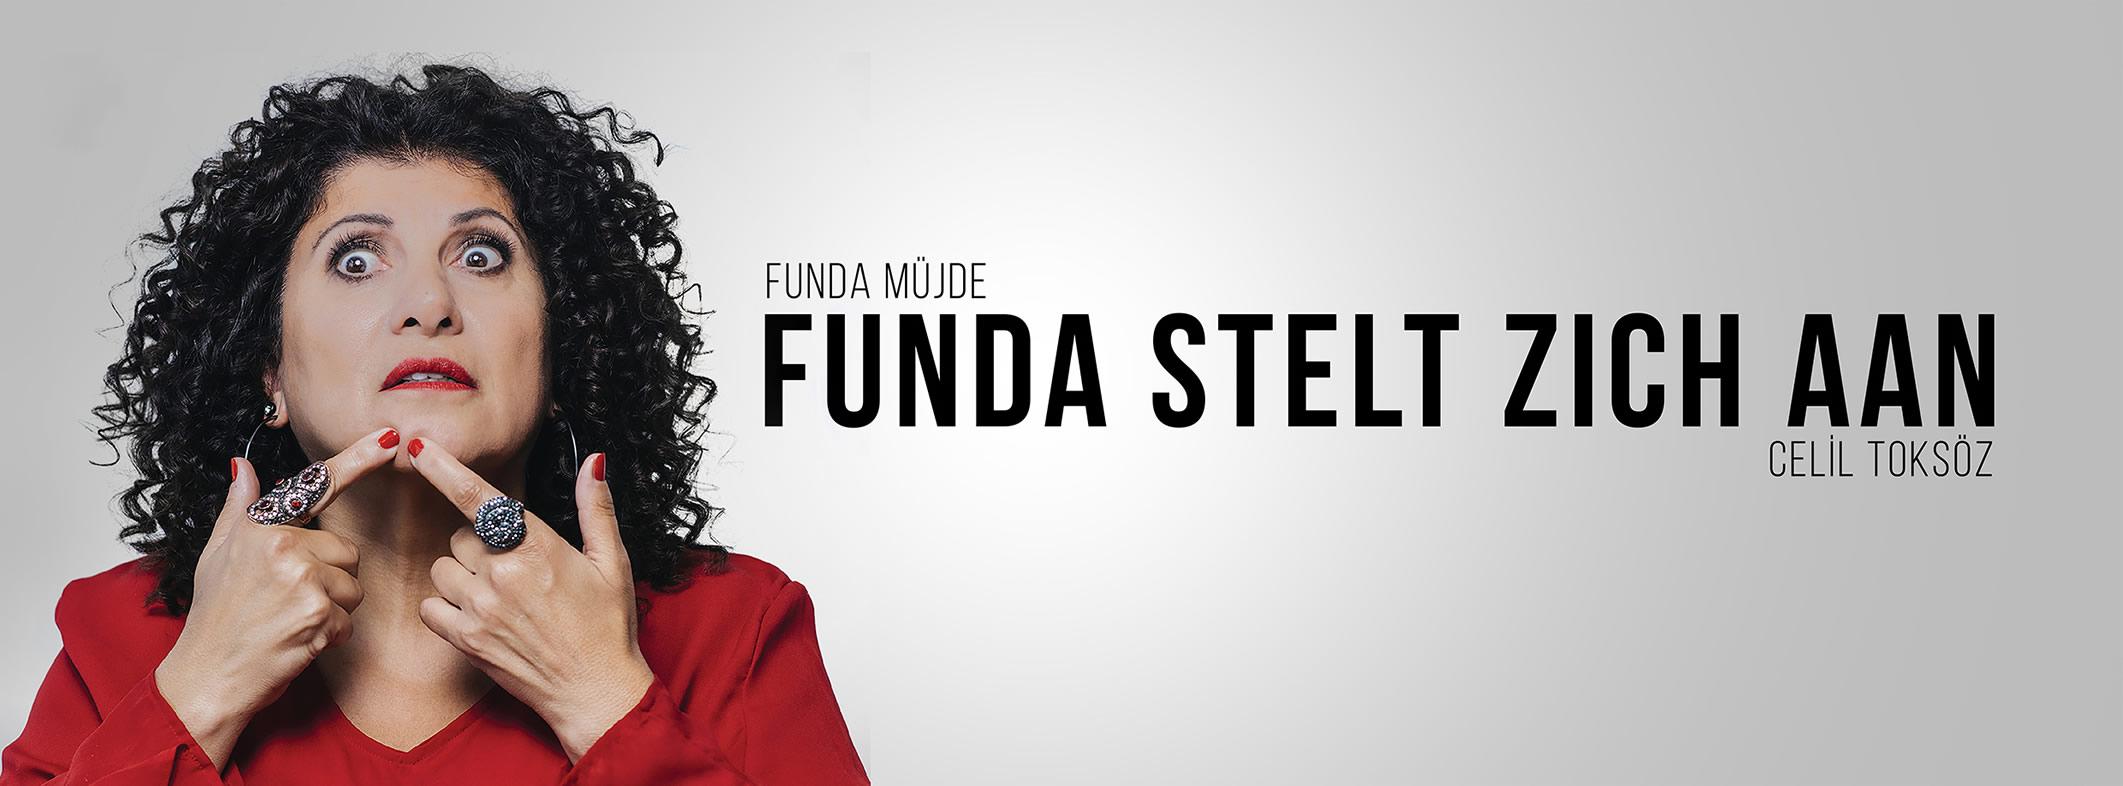 Funda Mujde - Funda stelt zich aan